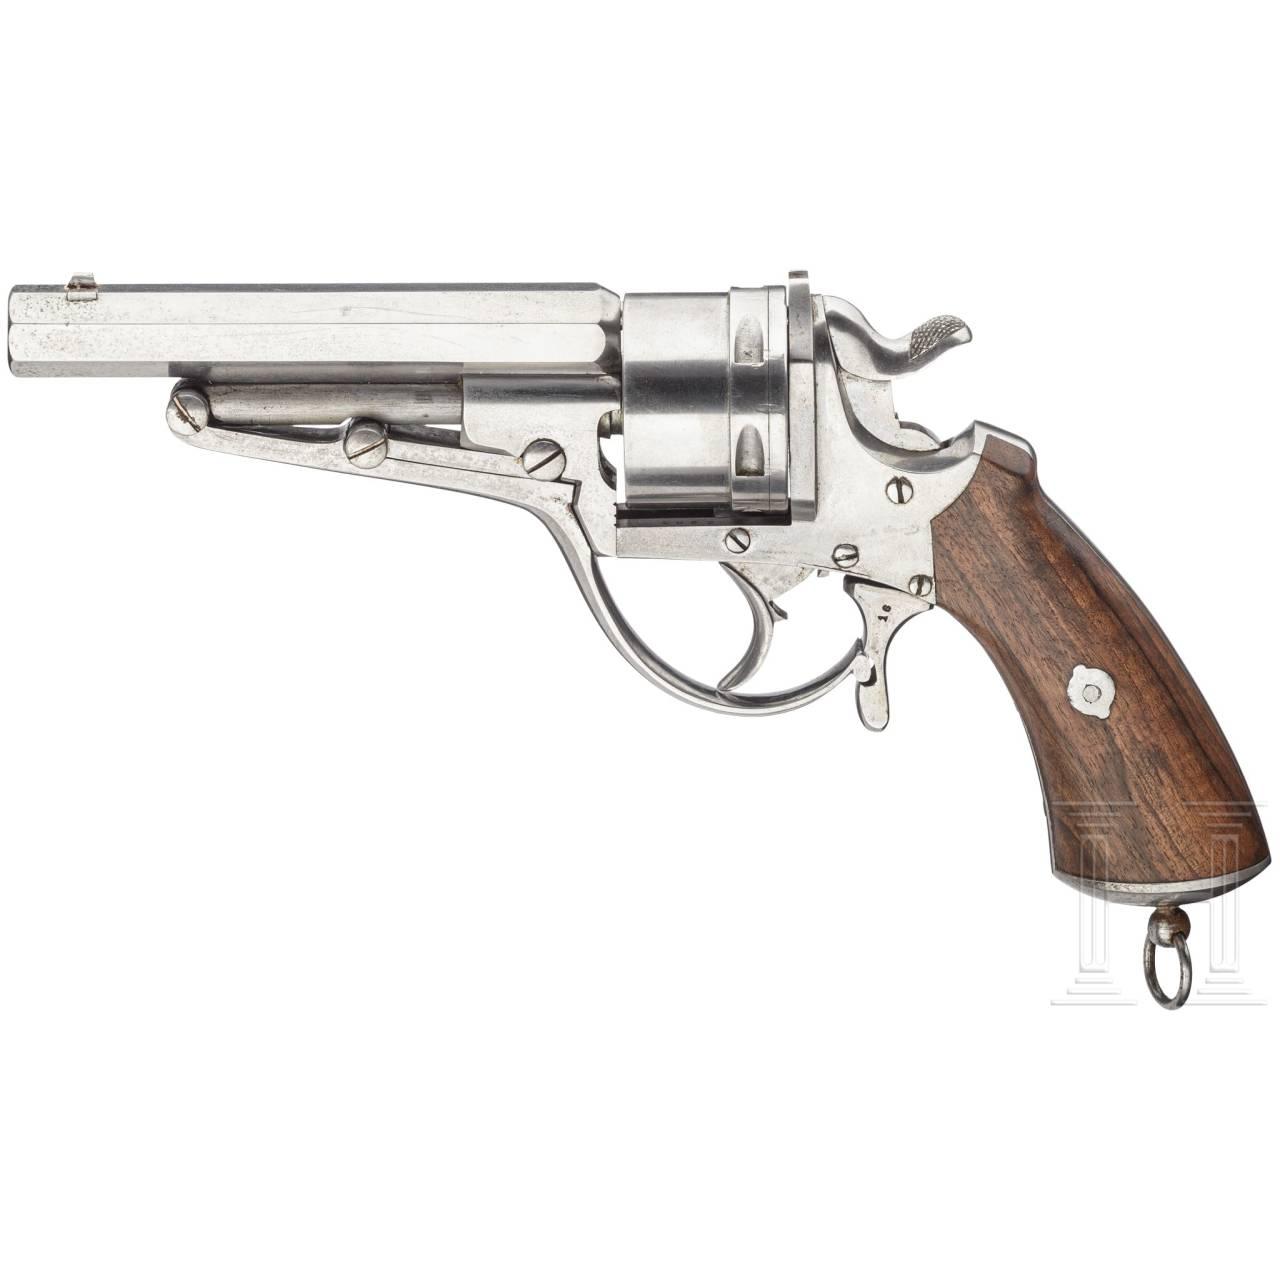 Revolver, C.F.G./ Galand